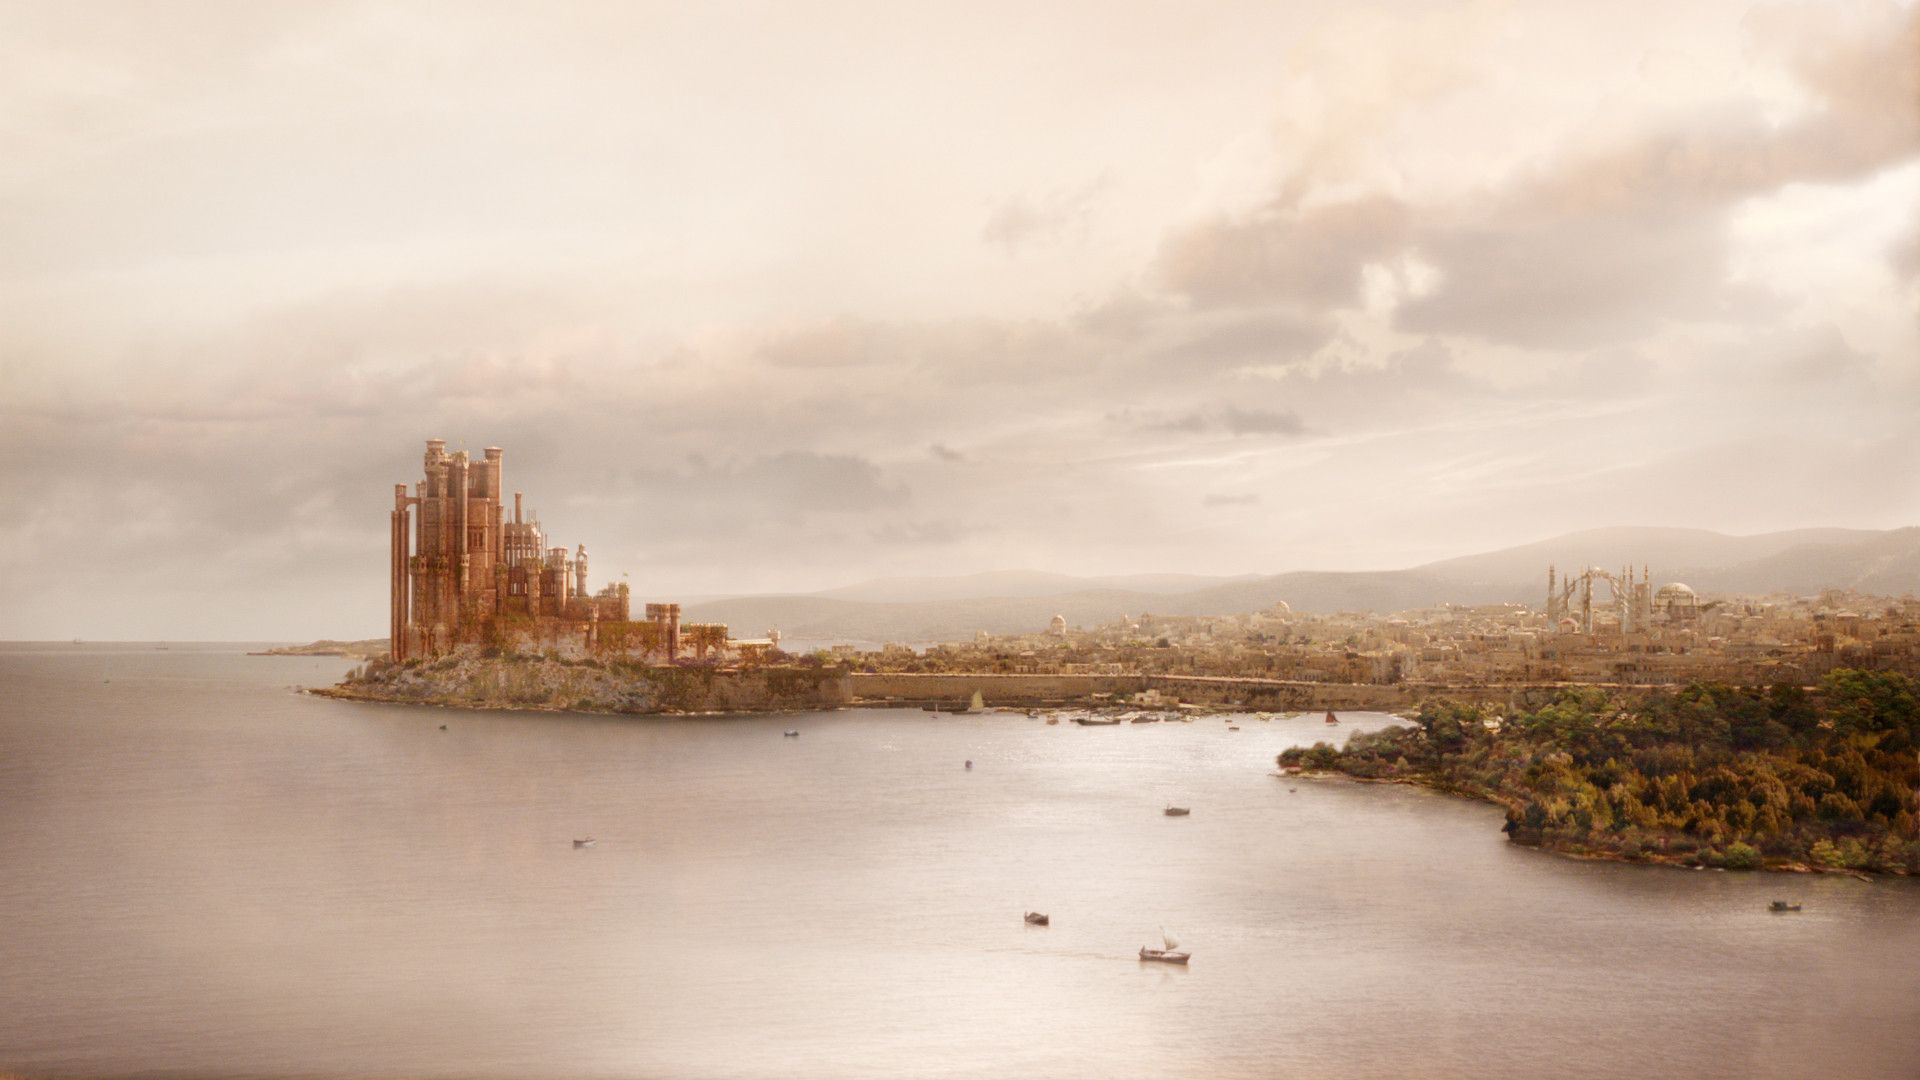 Game of Thrones landscape castle